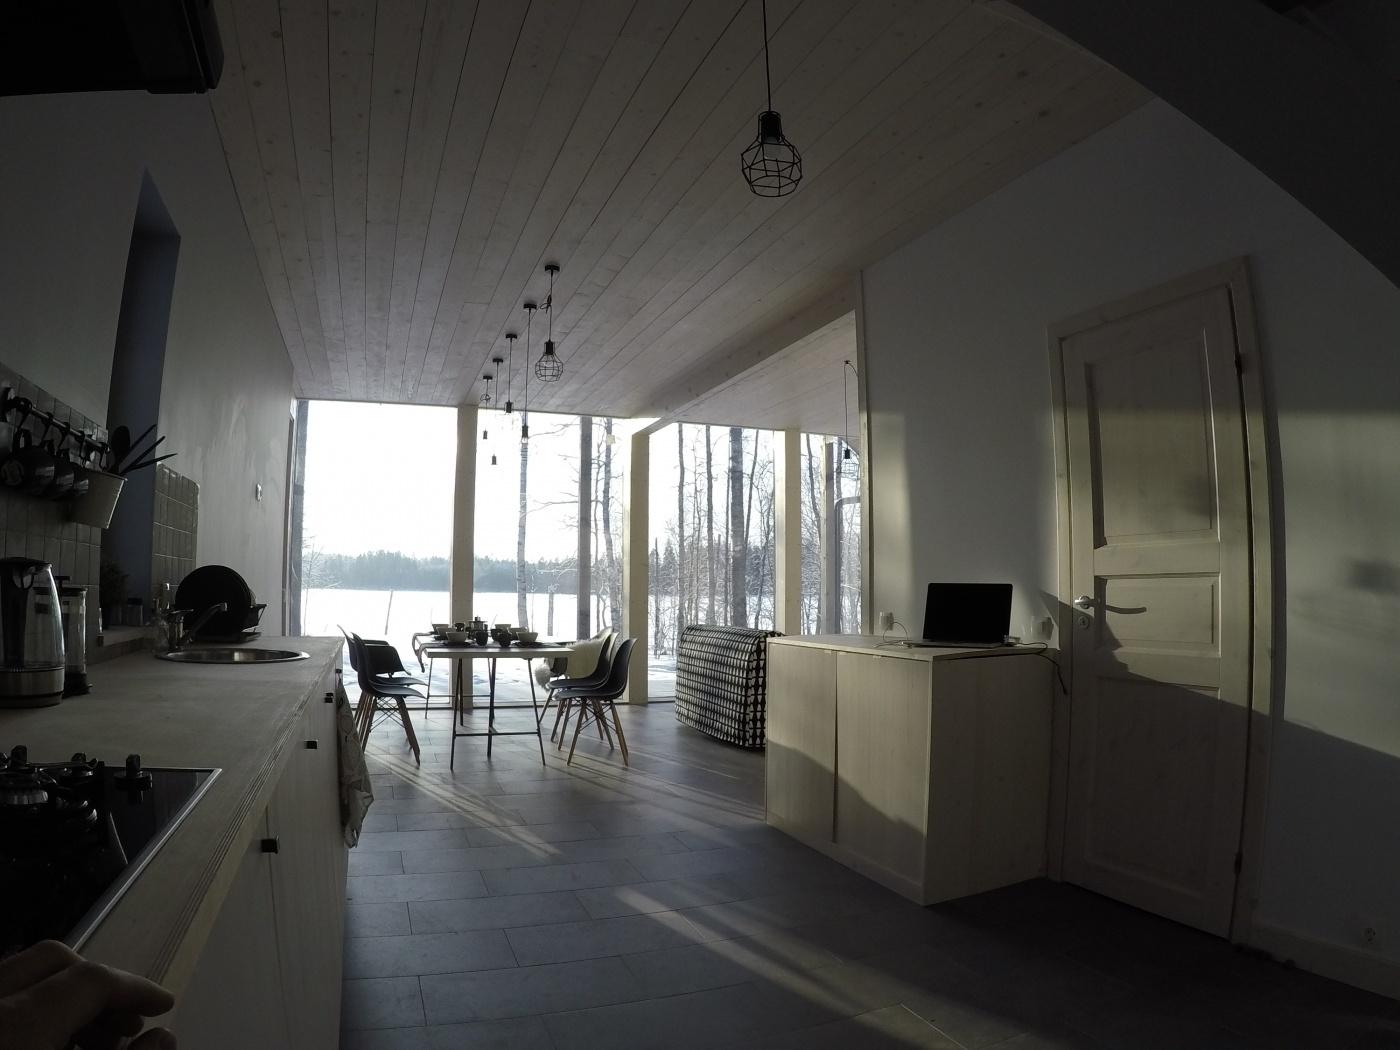 Коттеджный комплекс «Ахвенлампи» Республика Карелия Лофт-хаус «Матриярви», фото 8